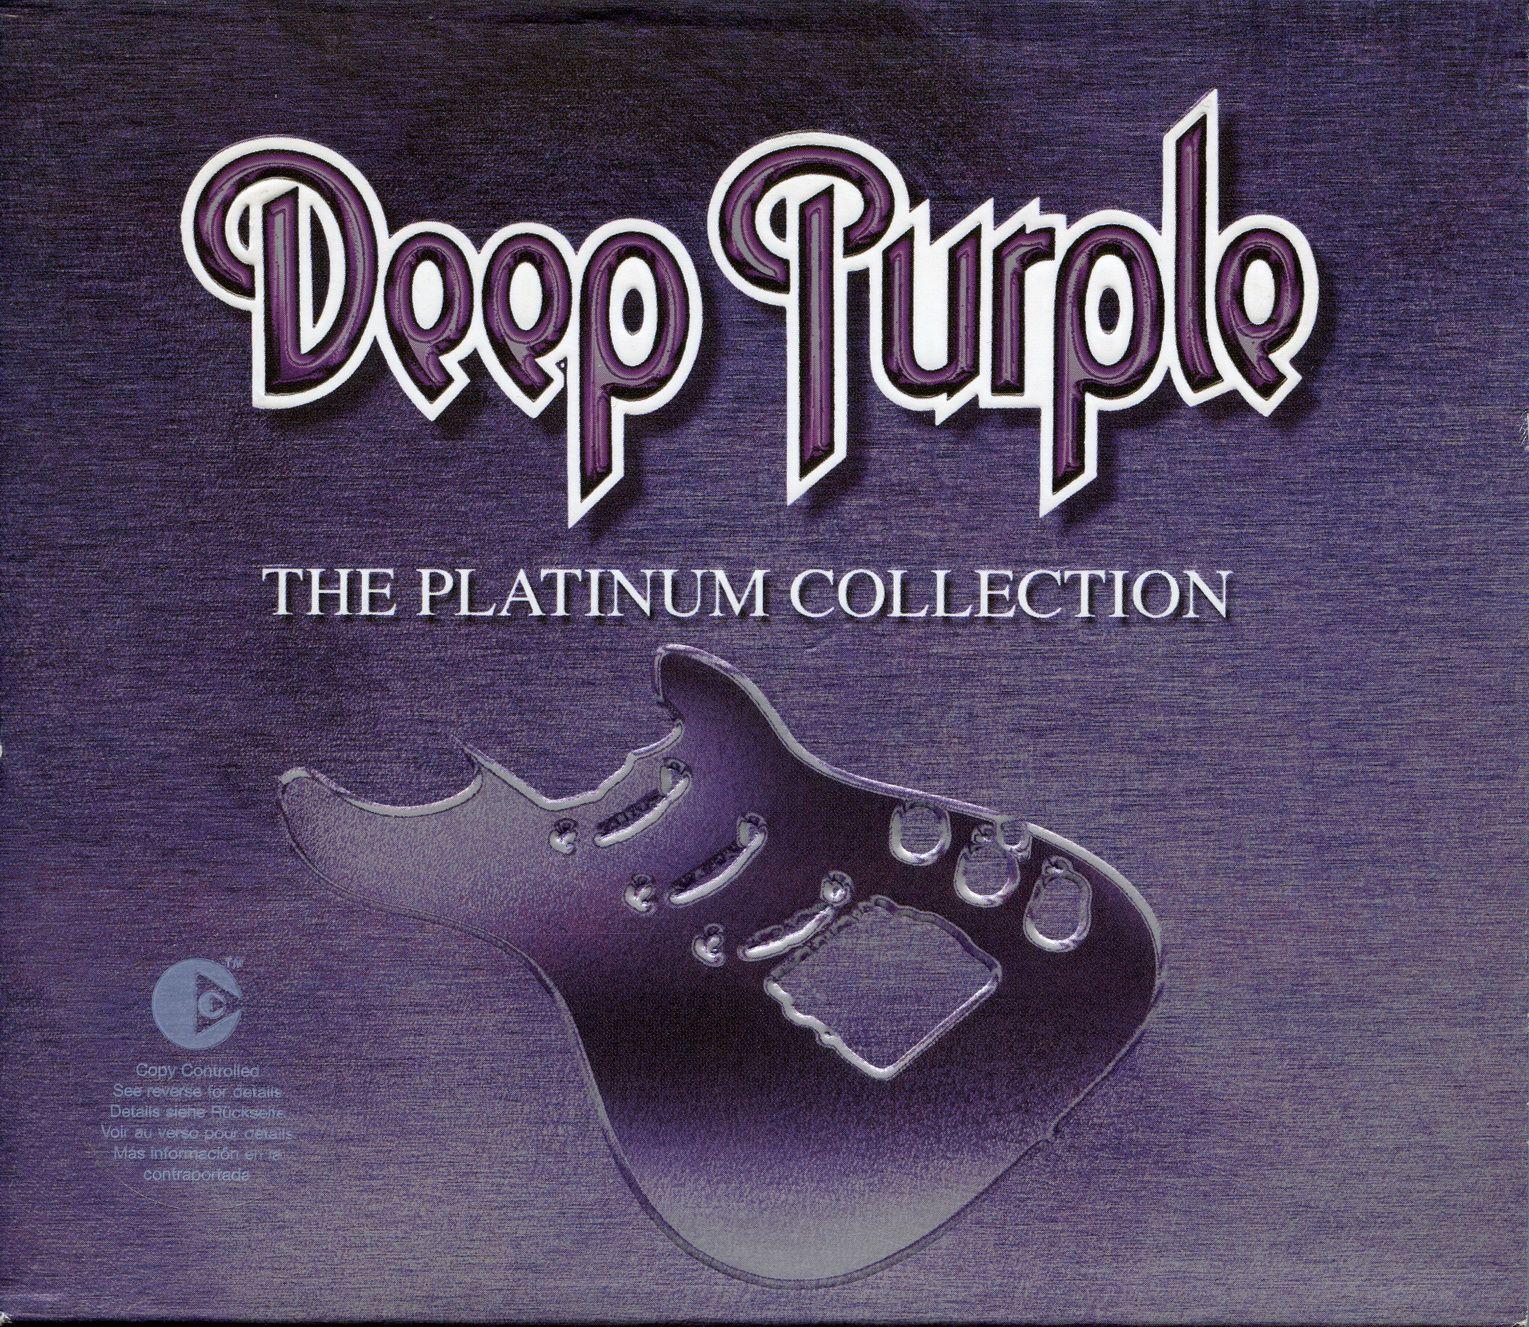 Deep Purple - The Platinum Collection album cover